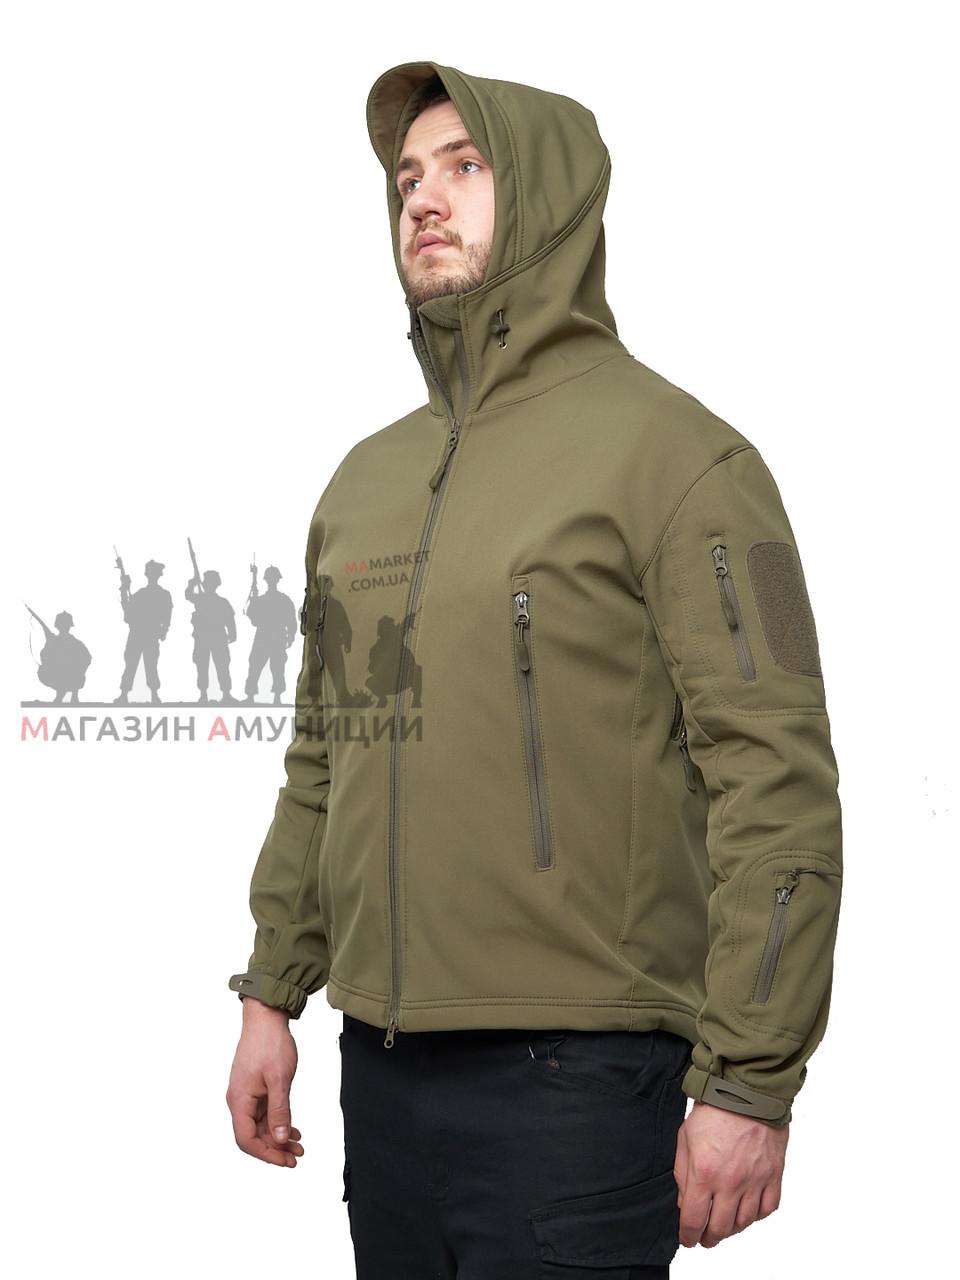 Куртка тактична Softshell Shark Skin 01. ESDY. Олива